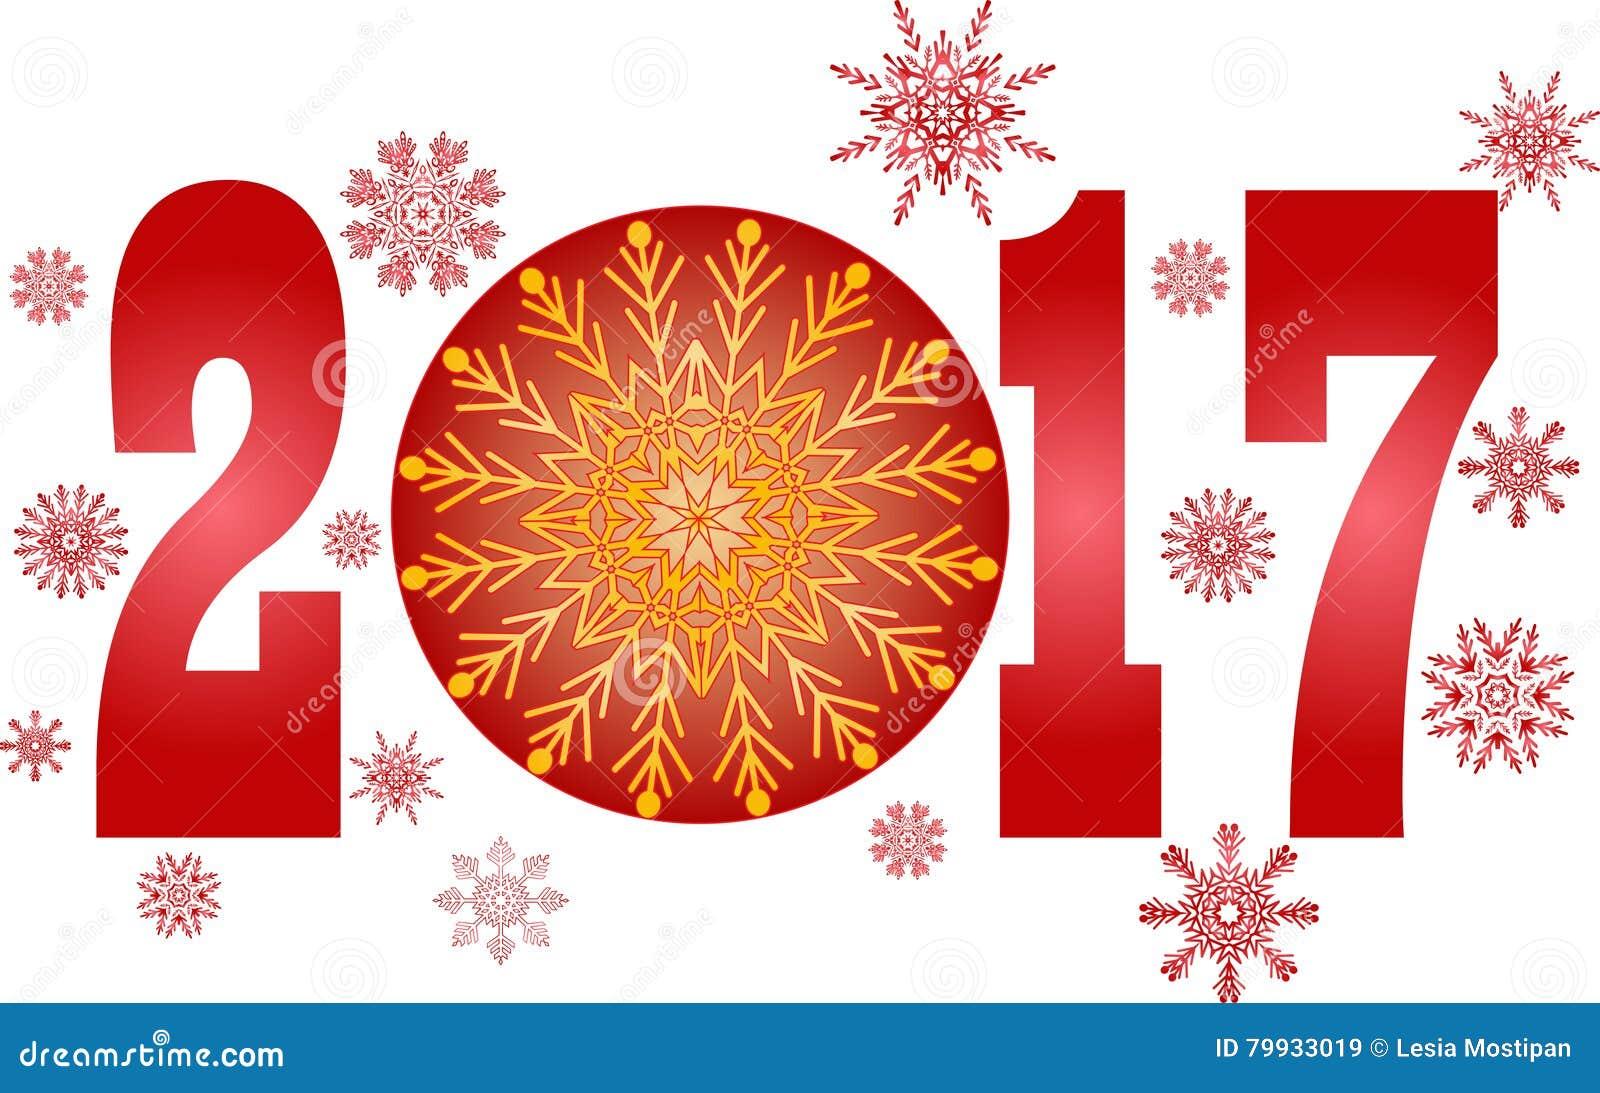 Seasons greetings happy new 2017 year stock vector seasons greetings happy new 2017 year modern ball kristyandbryce Choice Image